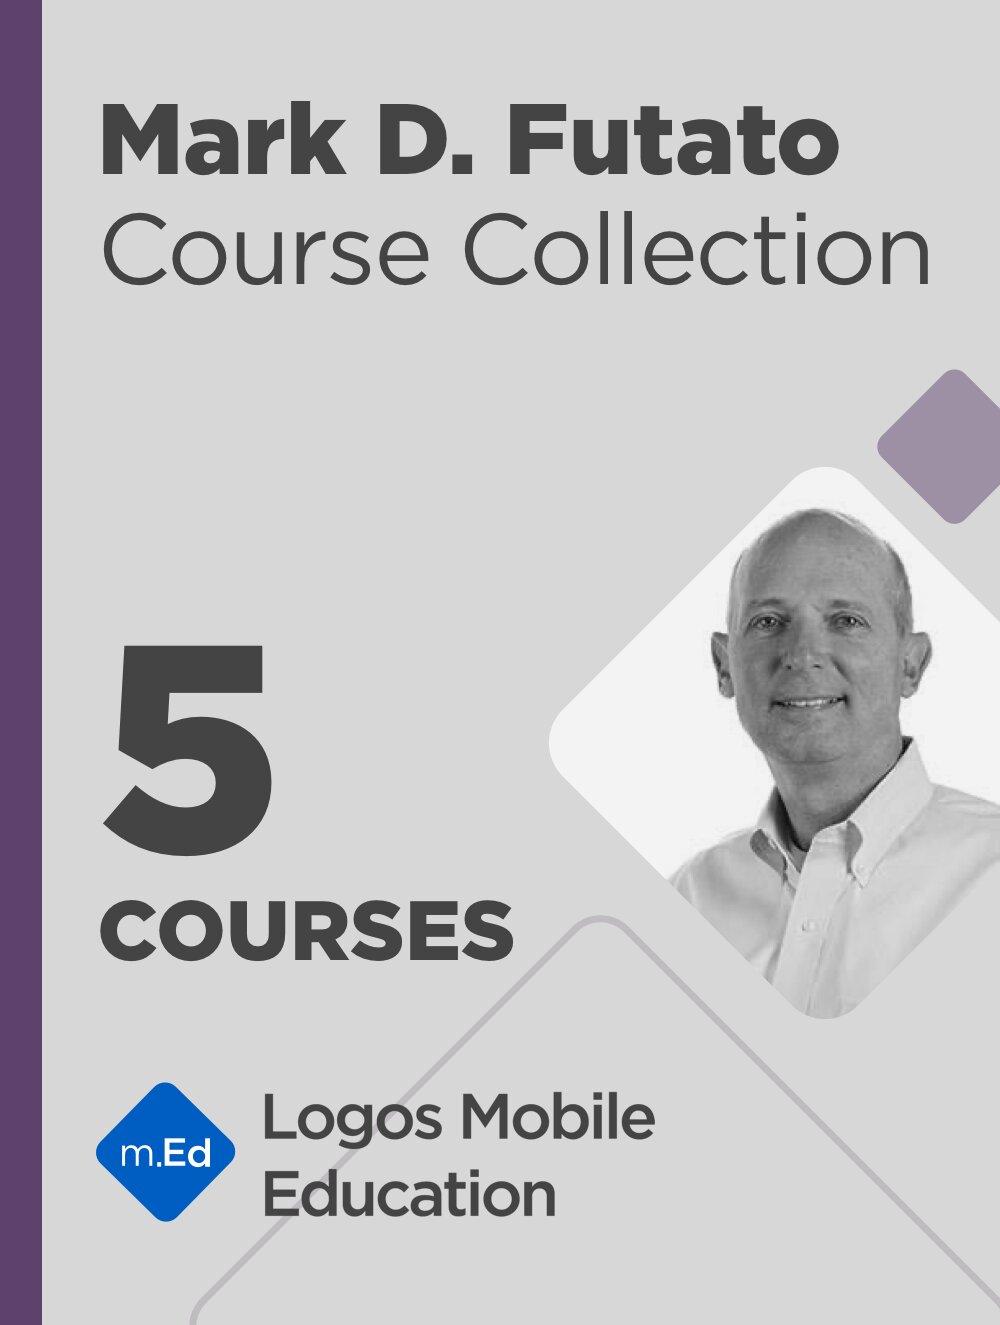 Mark D. Futato Course Collection (6 courses)